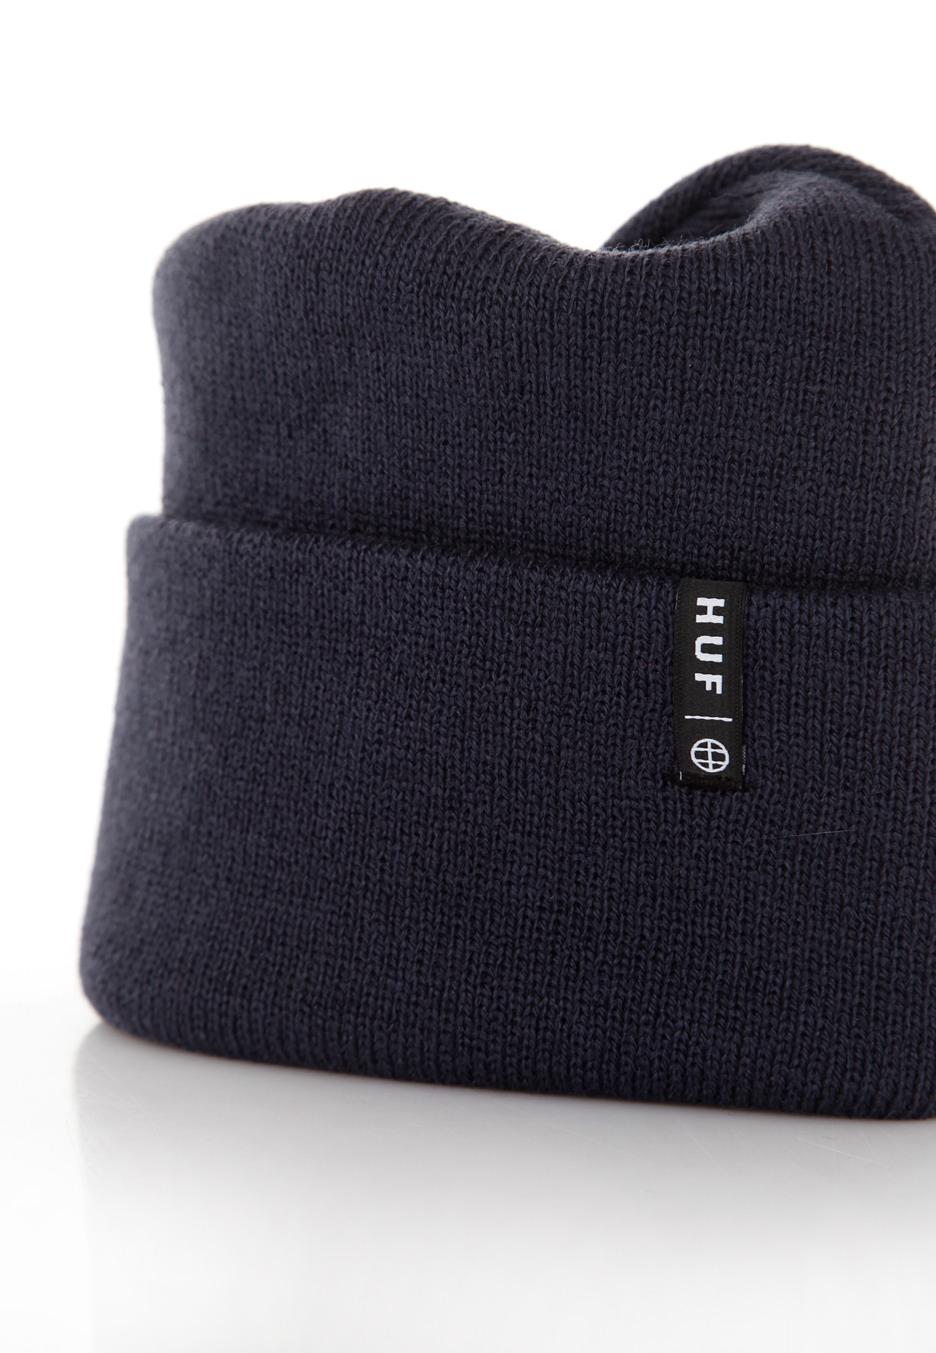 4e4b81a69ef HUF - Service Slate - Beanie - Streetwear Shop - Impericon.com Worldwide